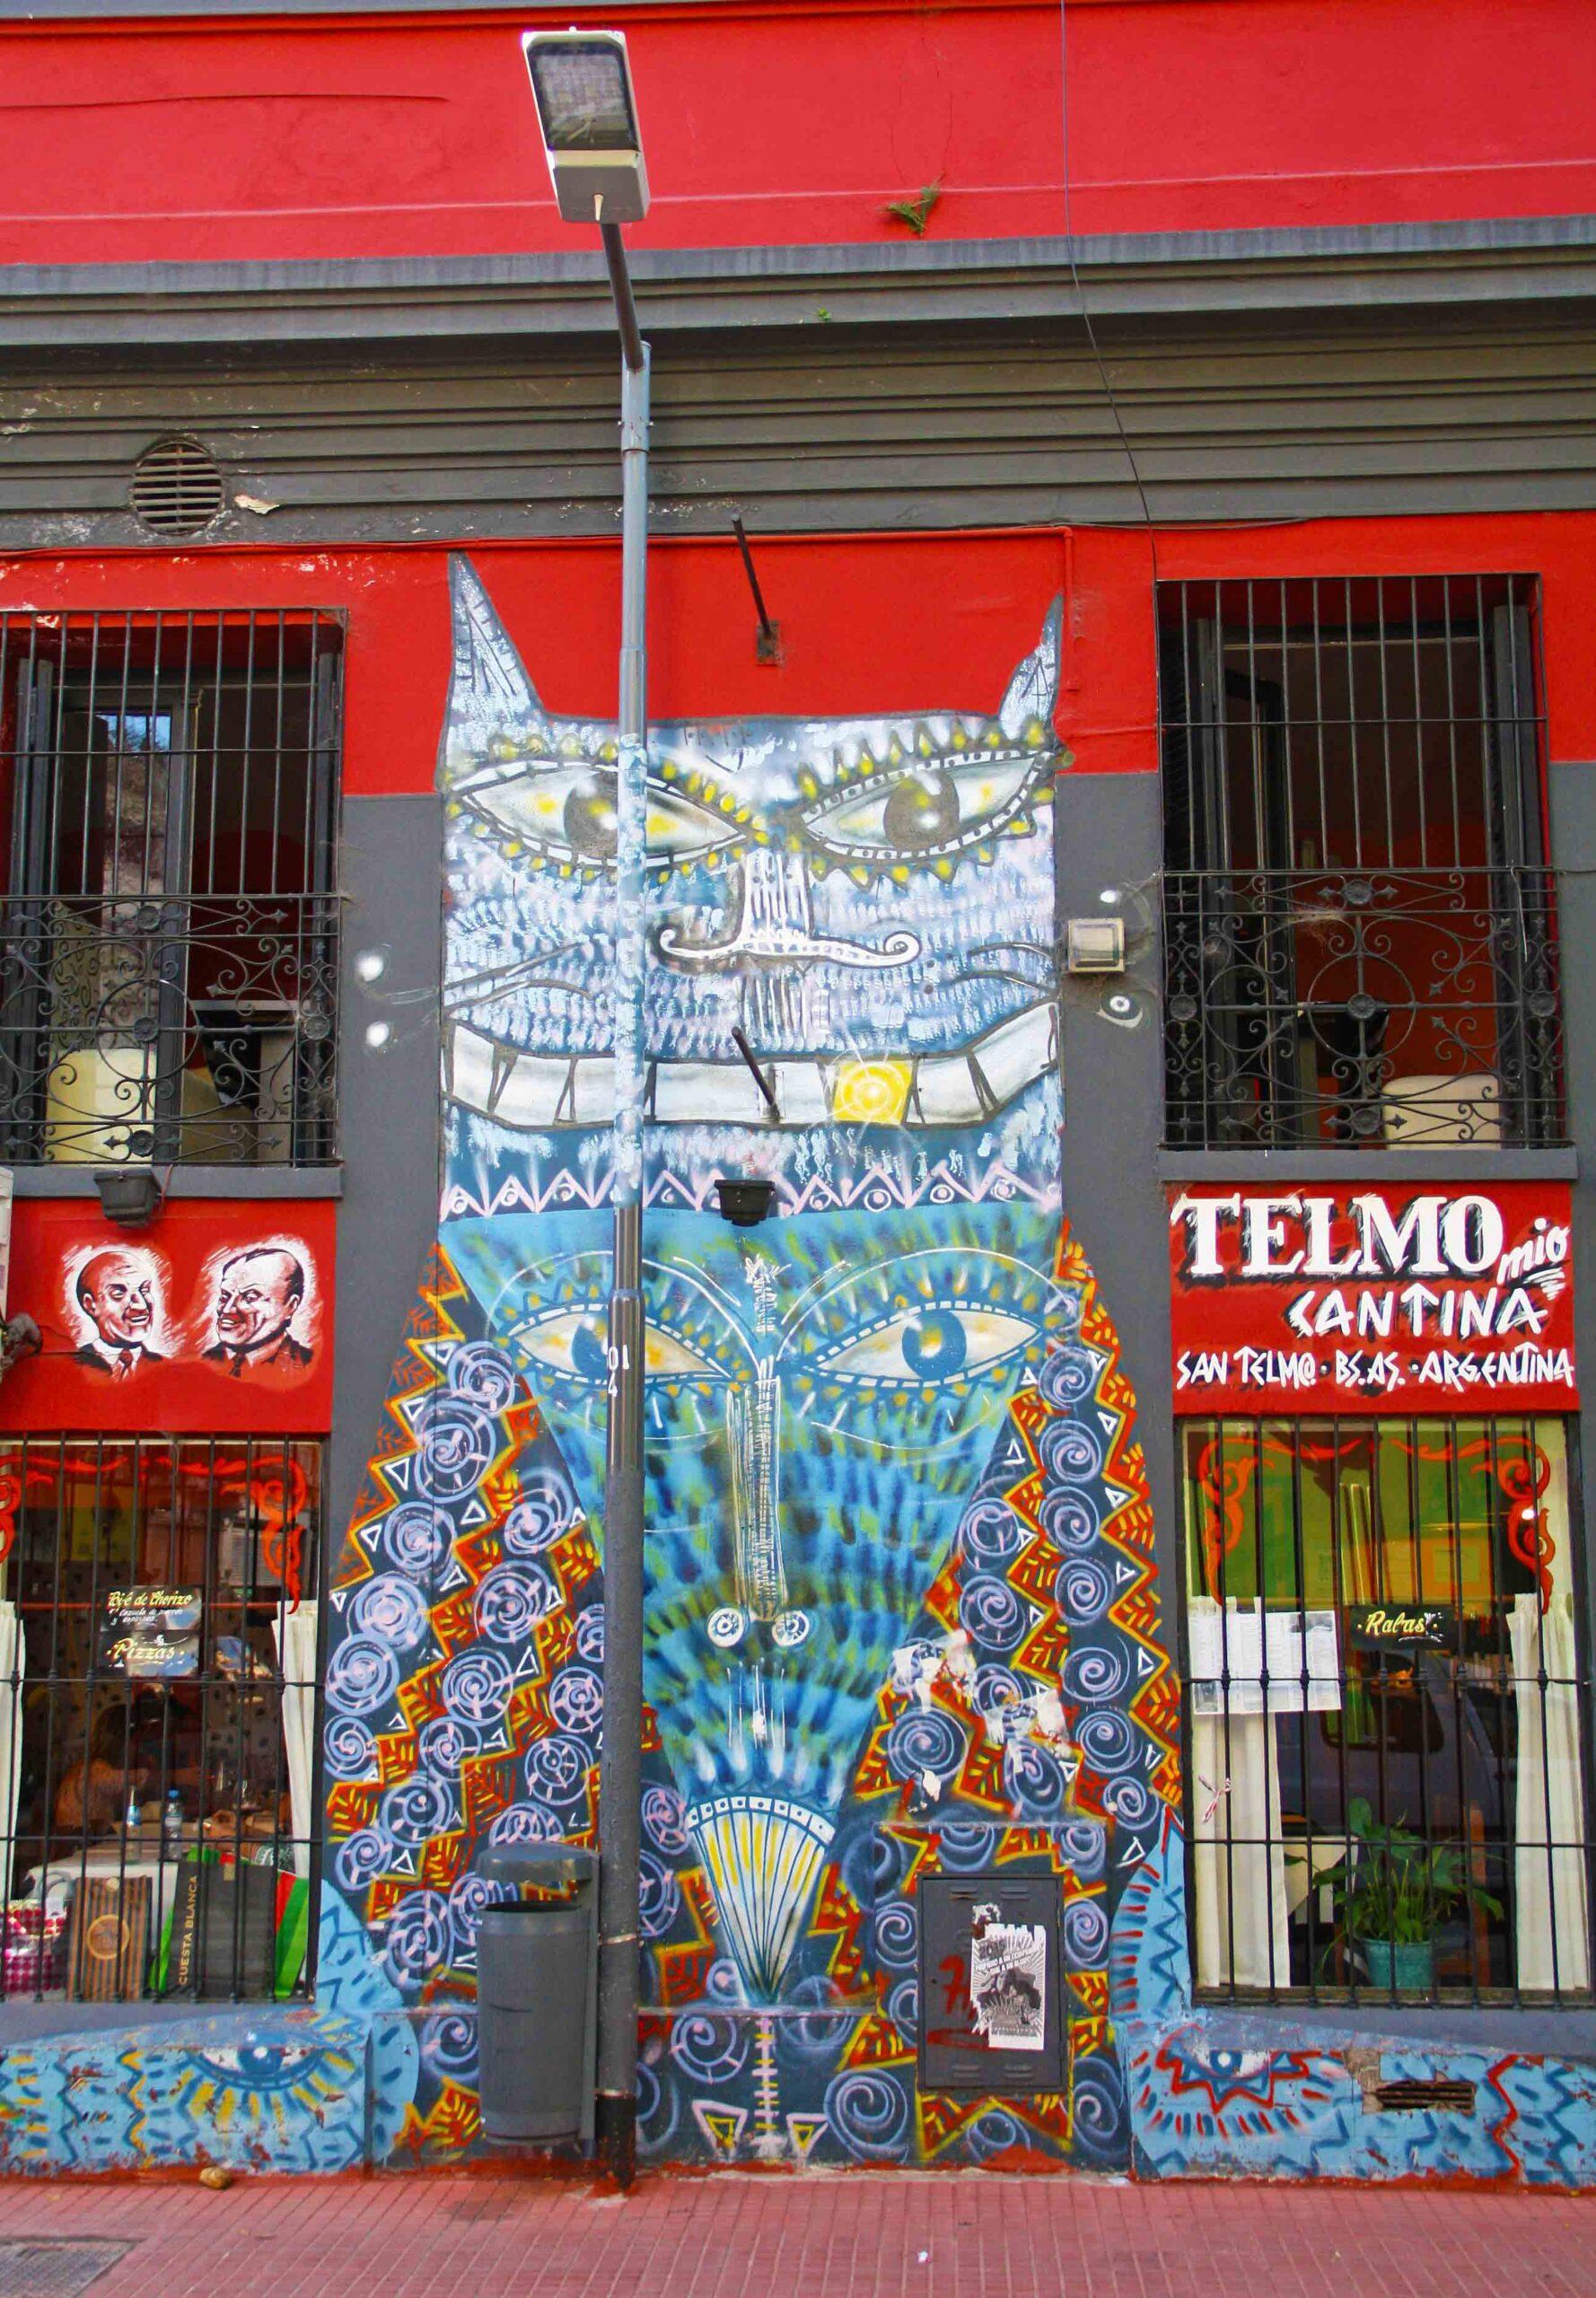 san telmo street art buenos aires